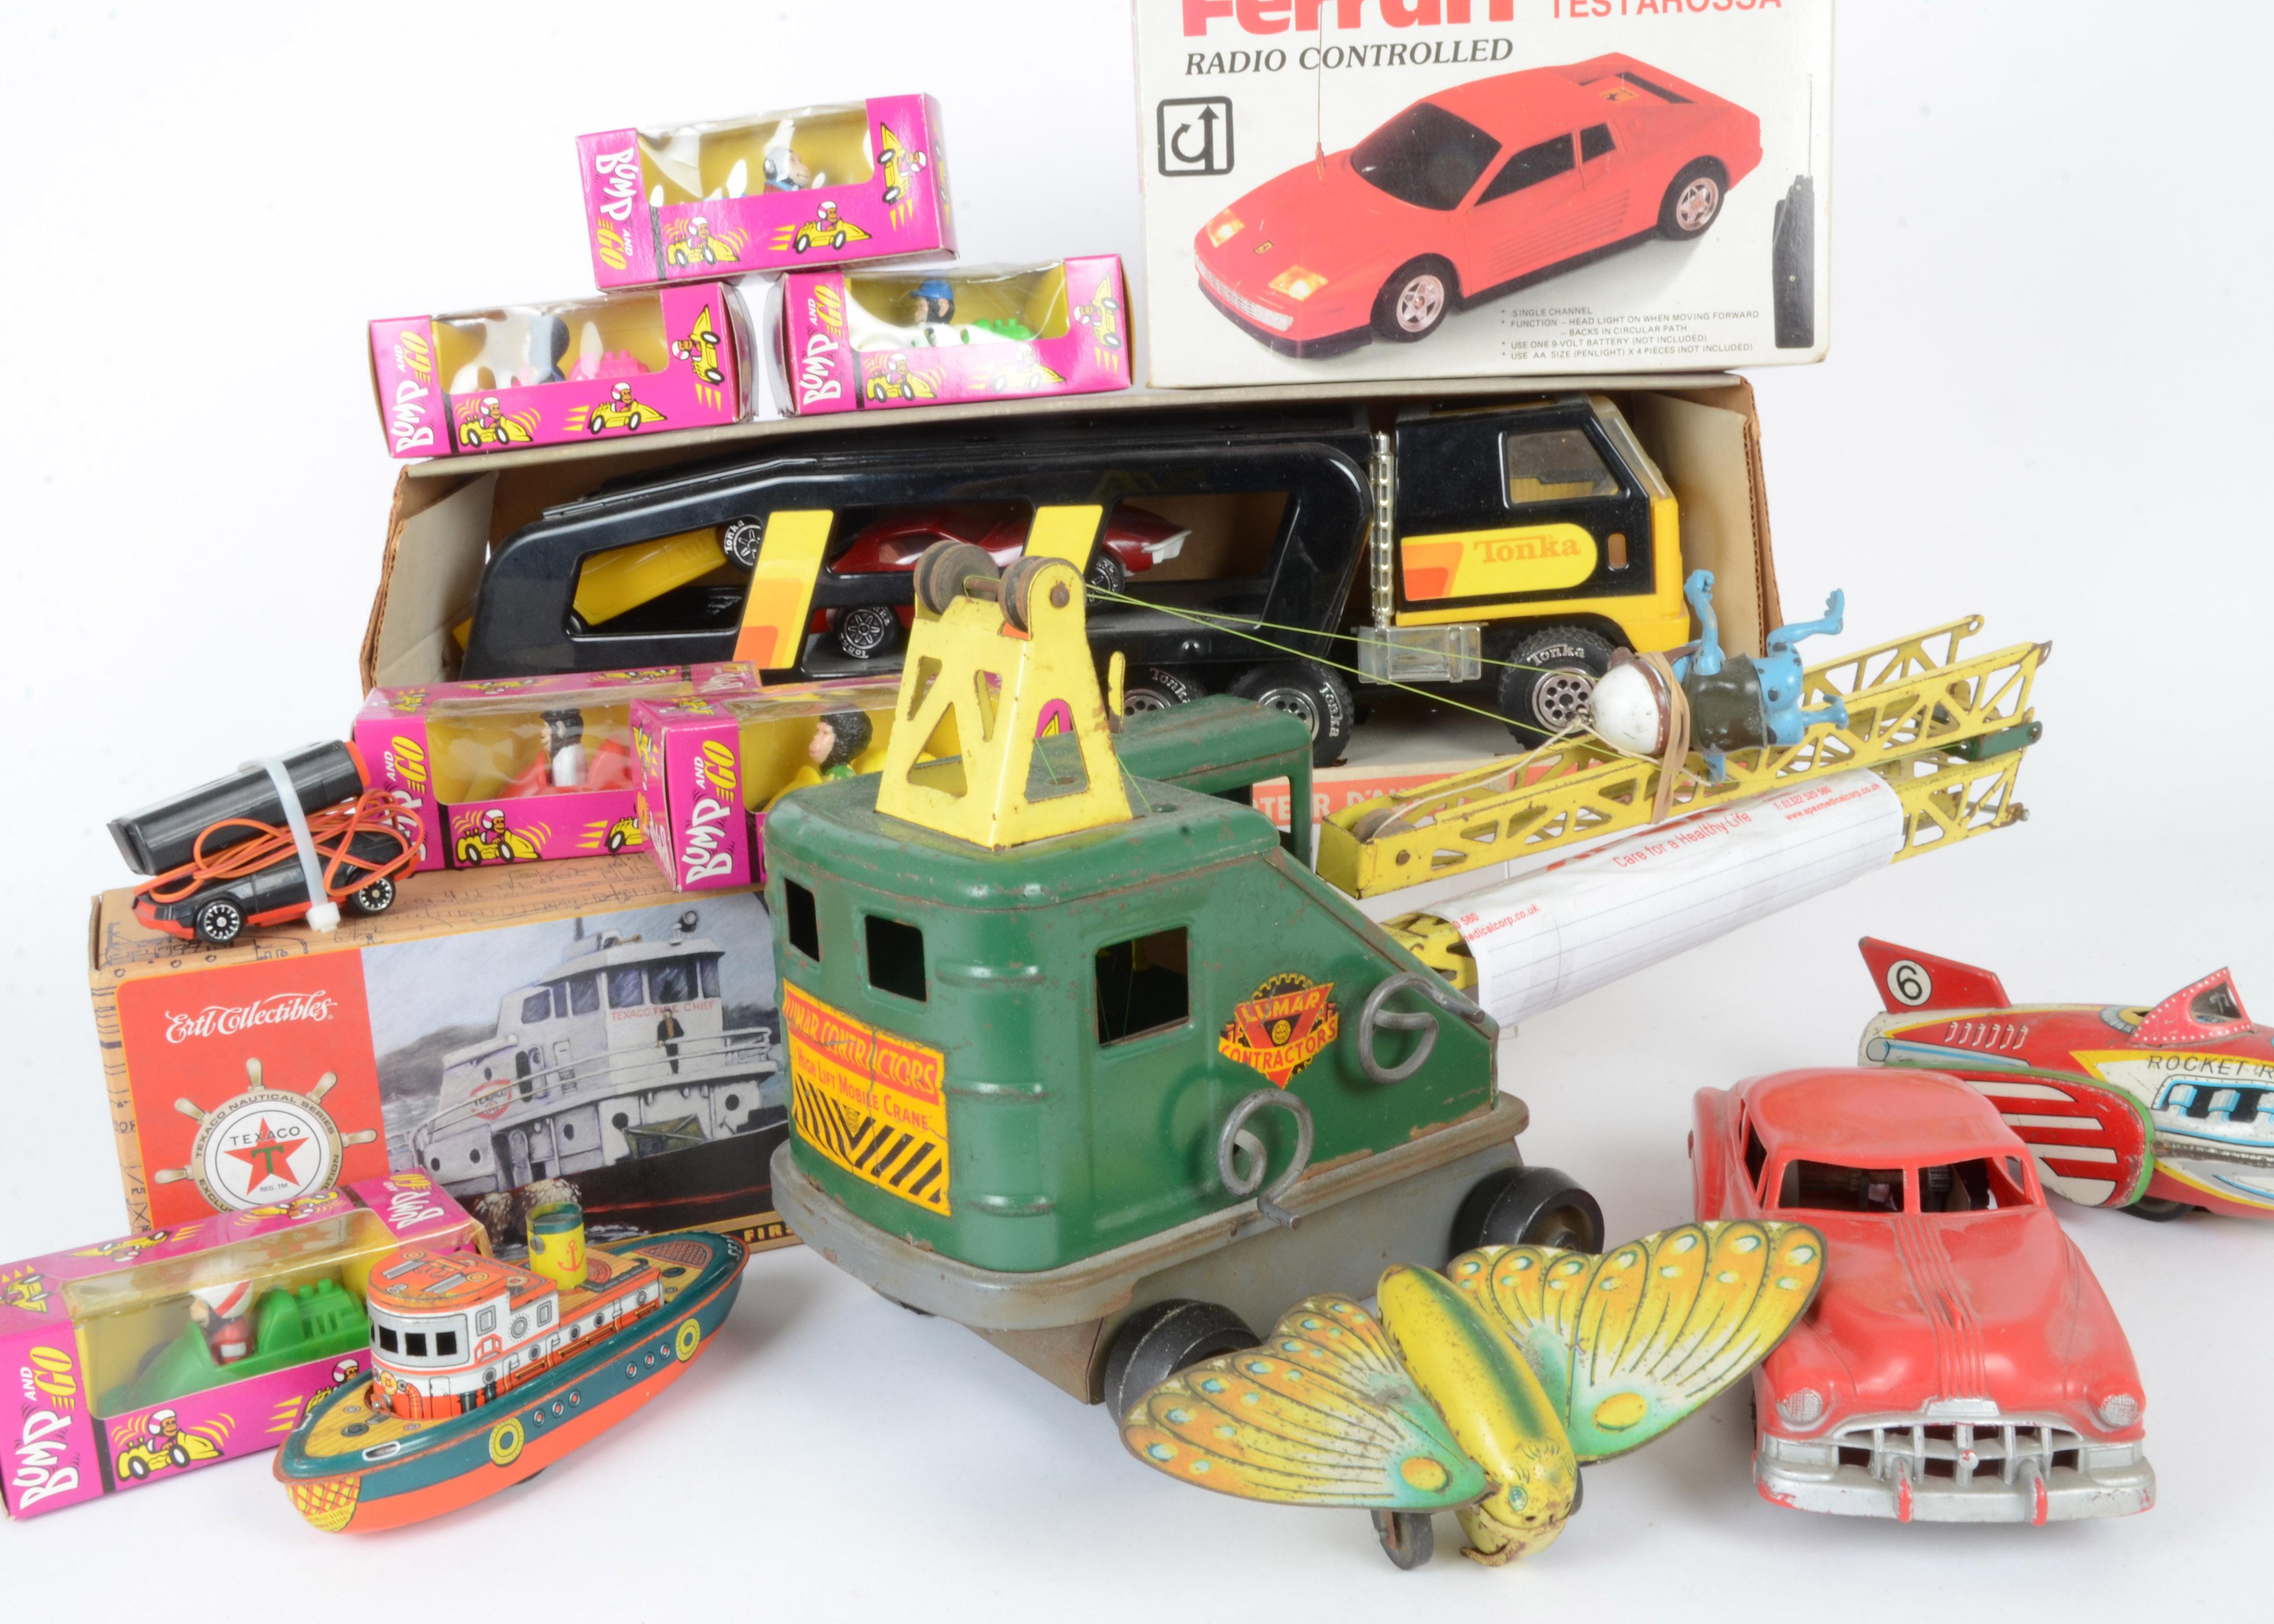 Lot 233 - Tonka Marks steel toys various Tin Toys and Brooke Bond Bump and Go vehicles, Tonka 1934 Car